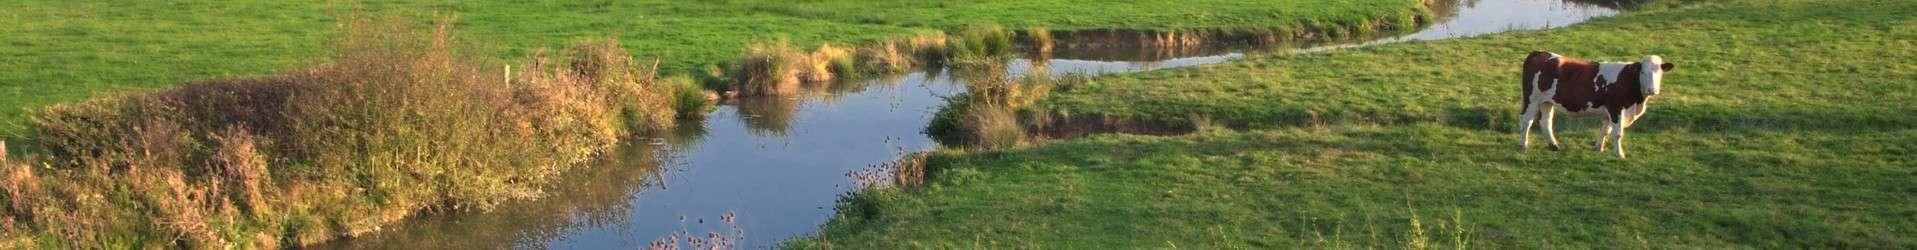 banniere-ruisseau-amedee-de-almeida-43